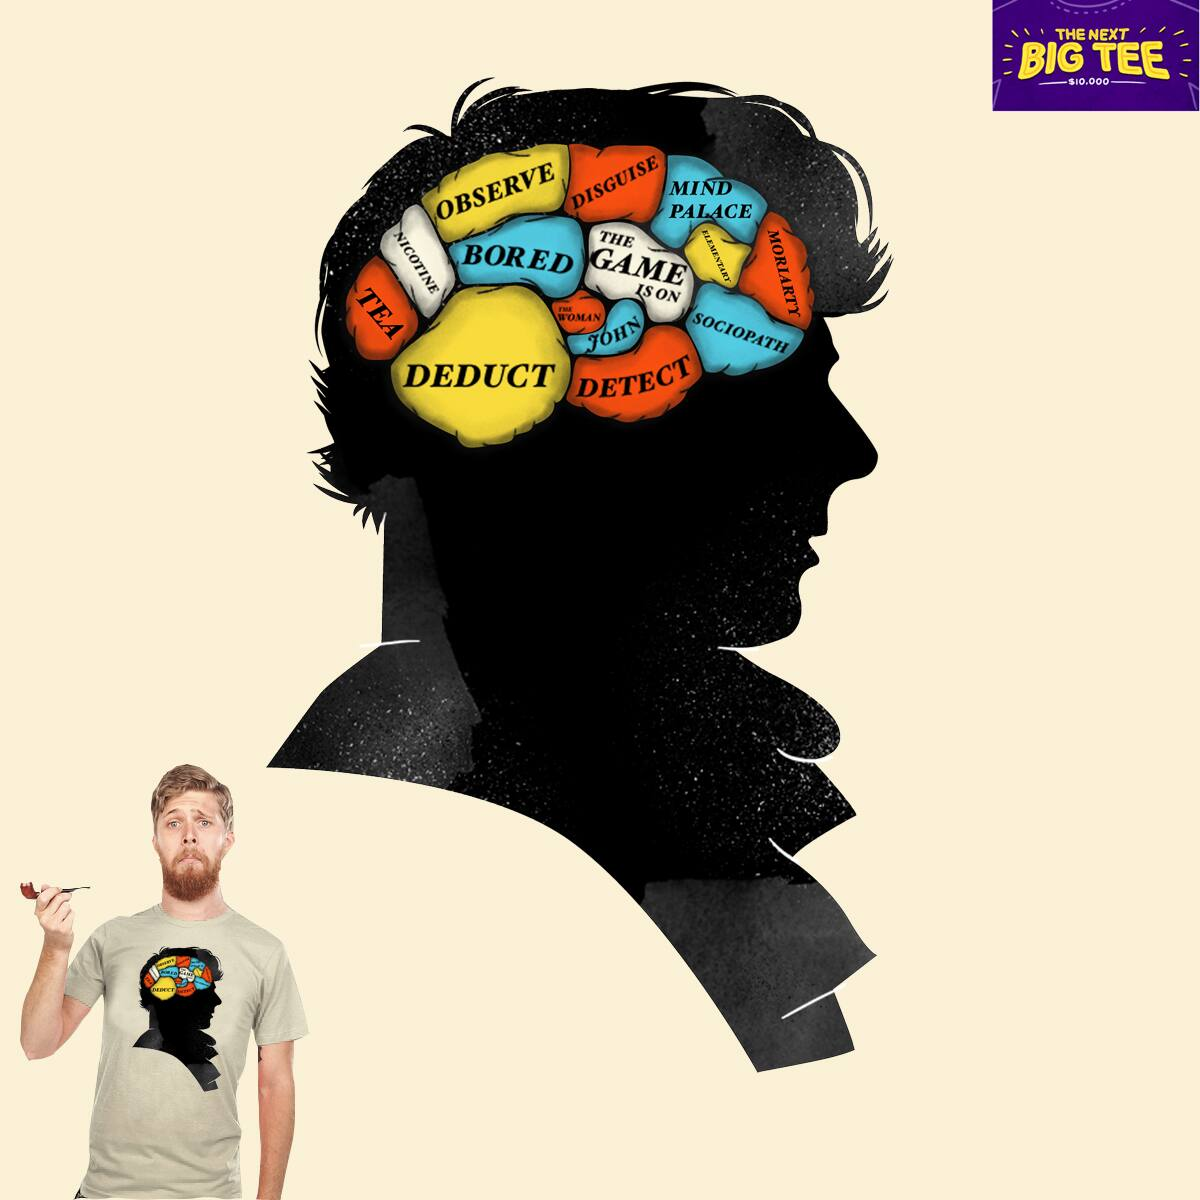 Sherlock Phrenology by Wharton on Threadless